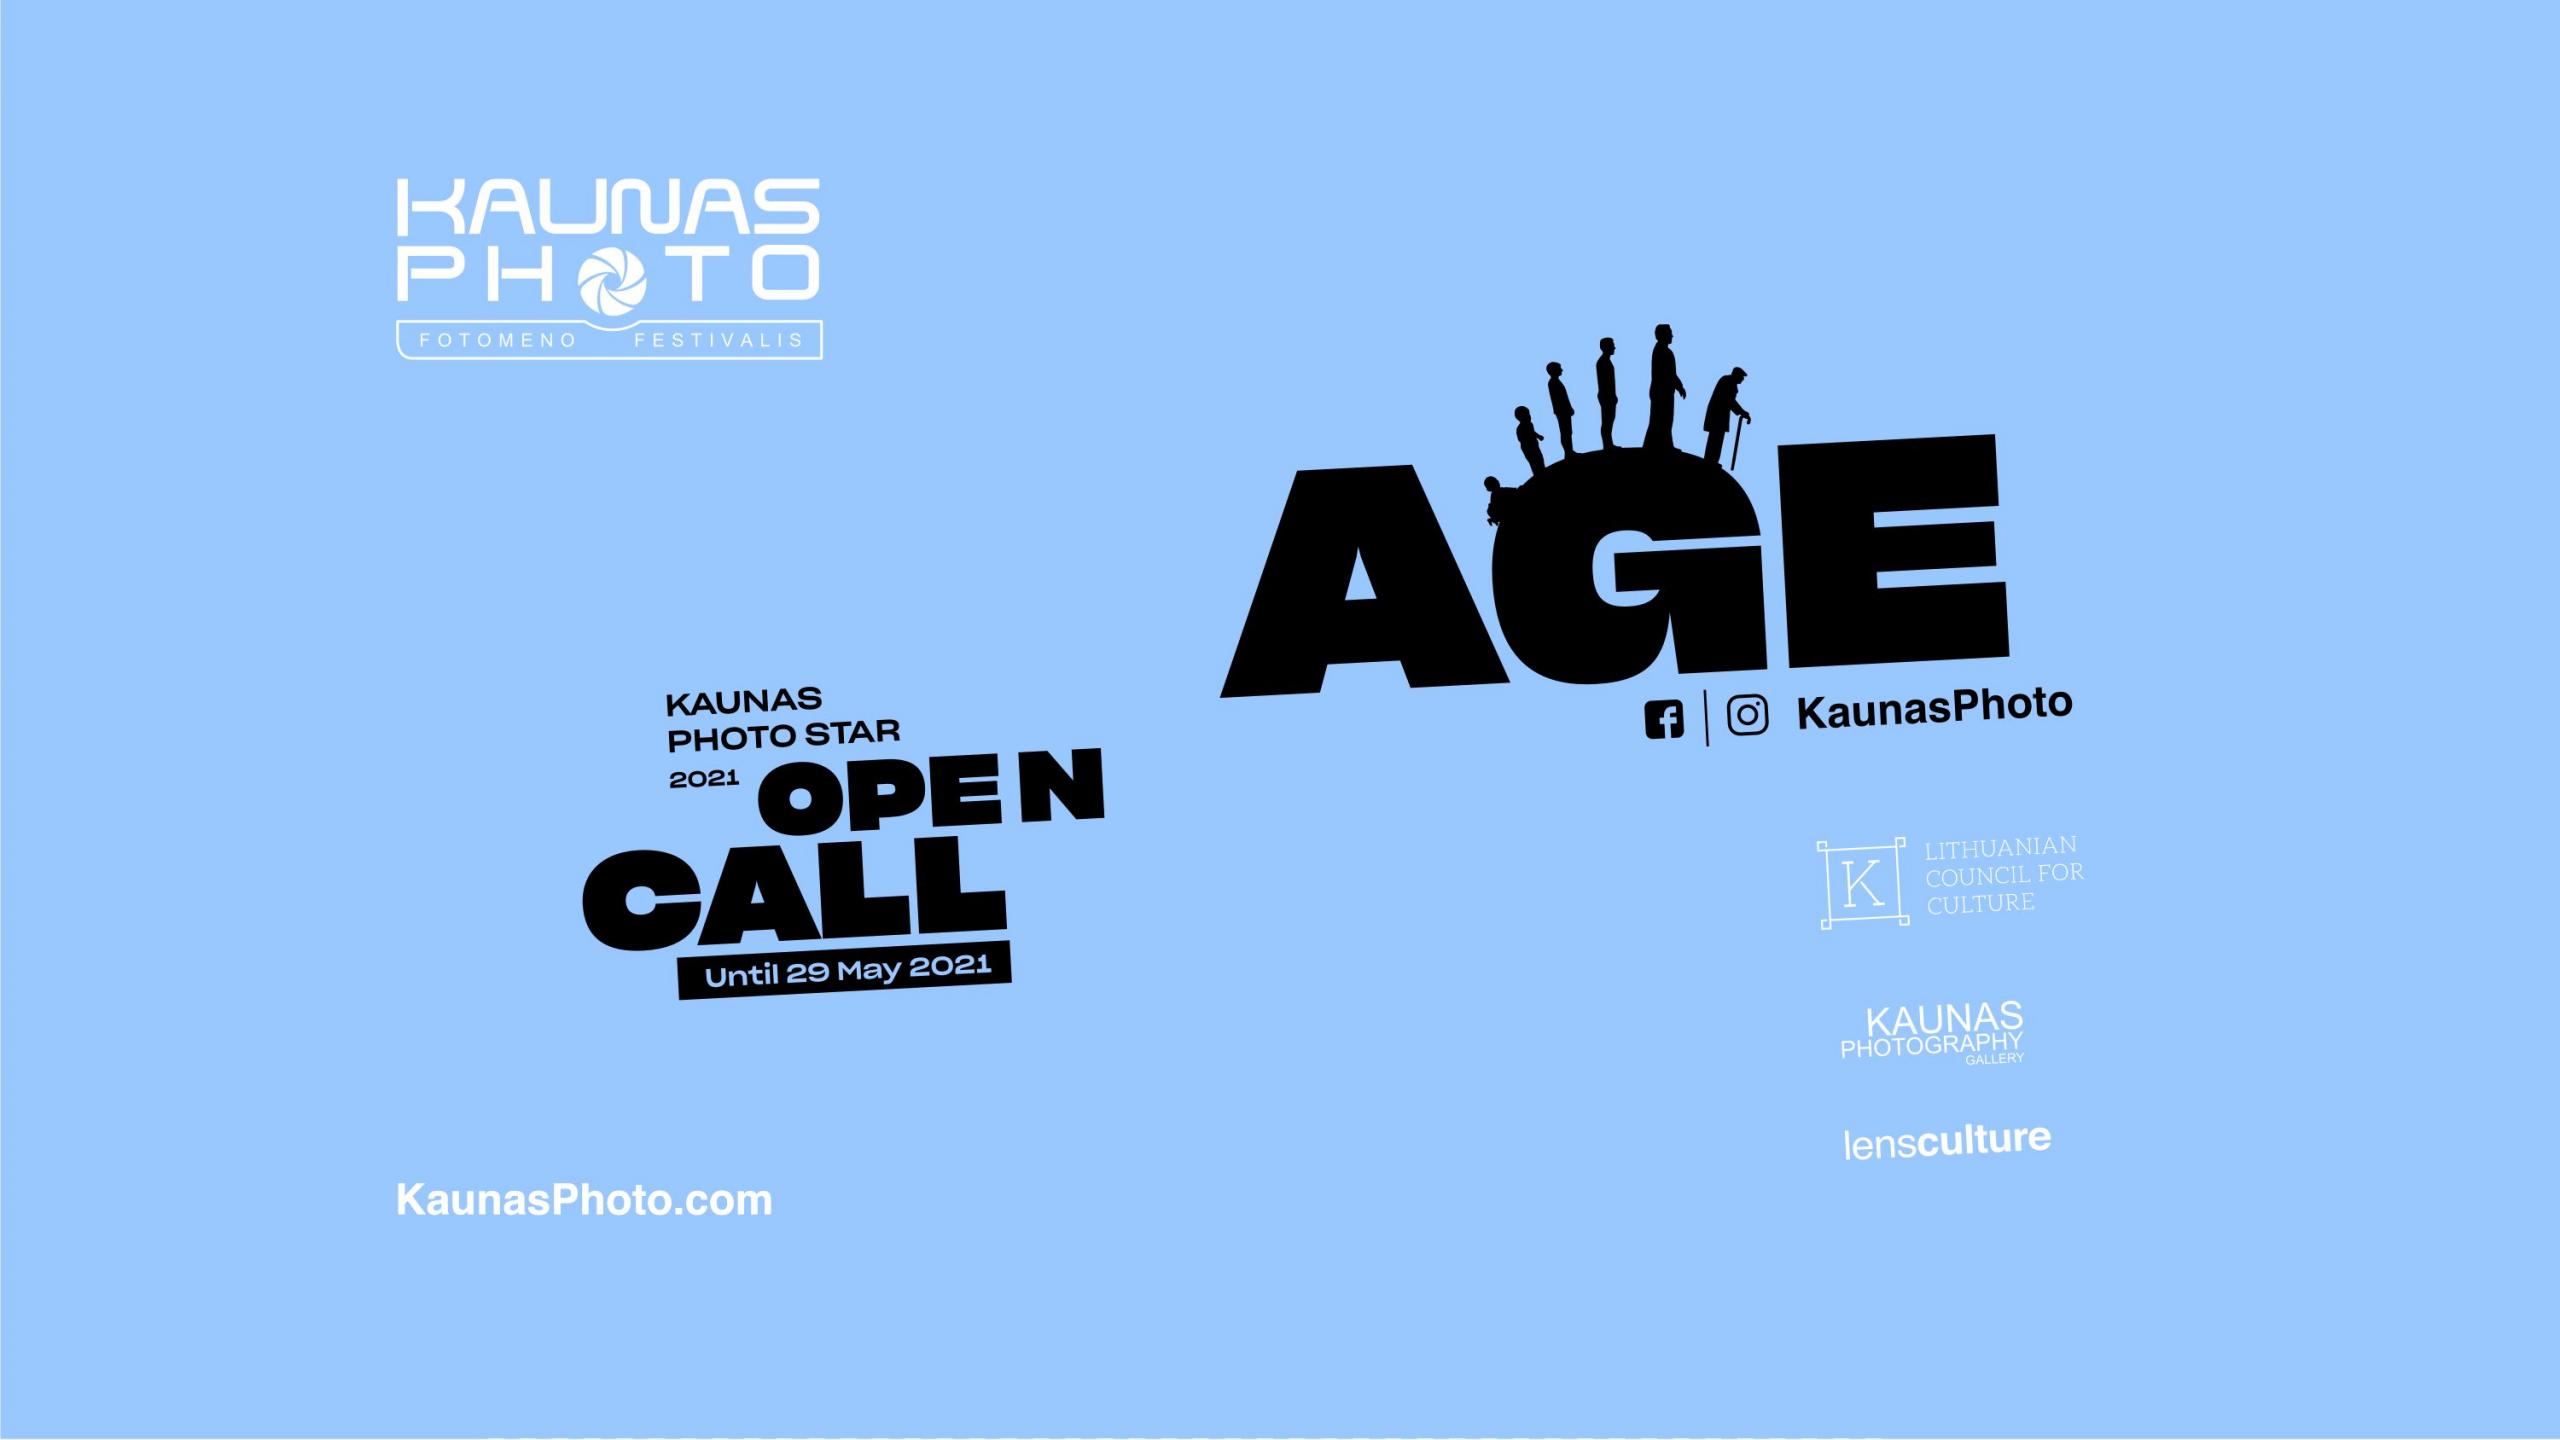 Kaunas Photo 2021 – Open Call